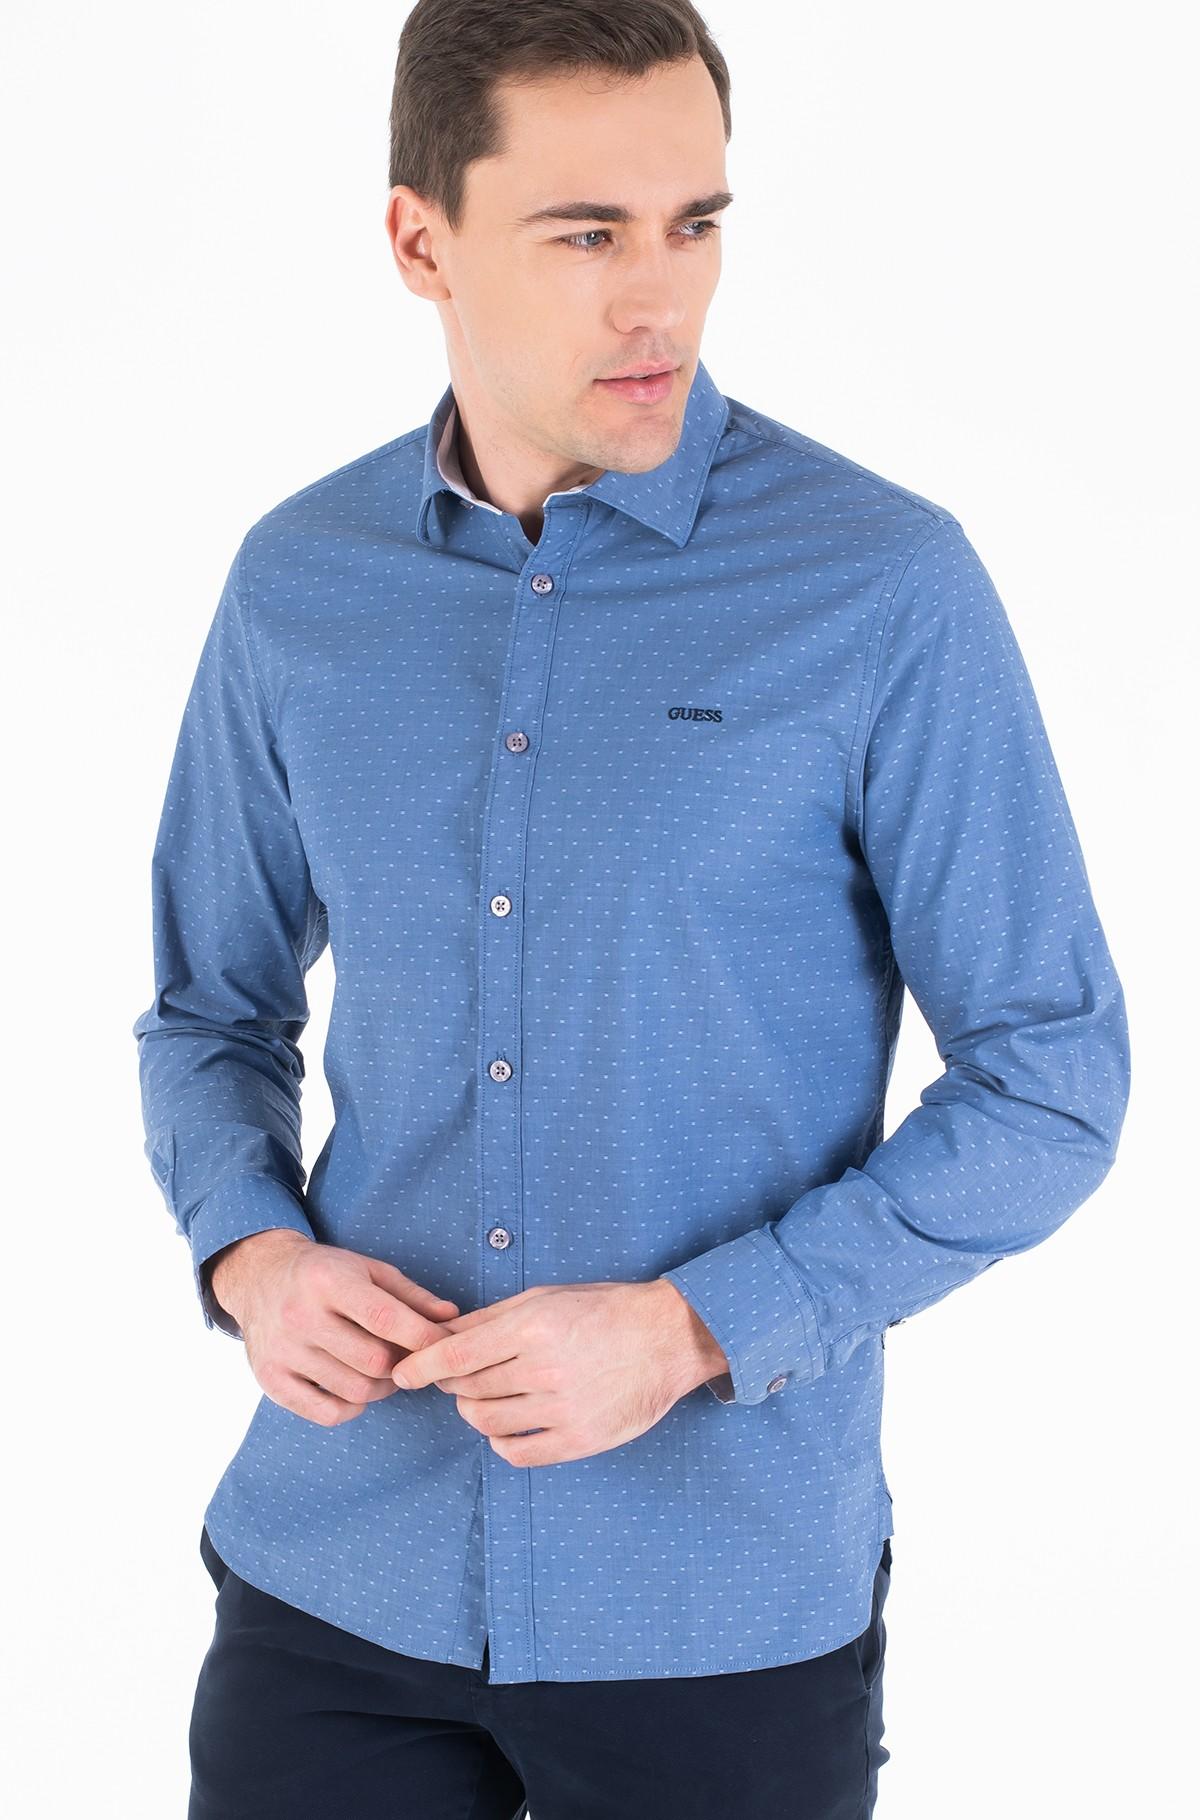 Marškiniai M01H13 WCJQ0-full-1